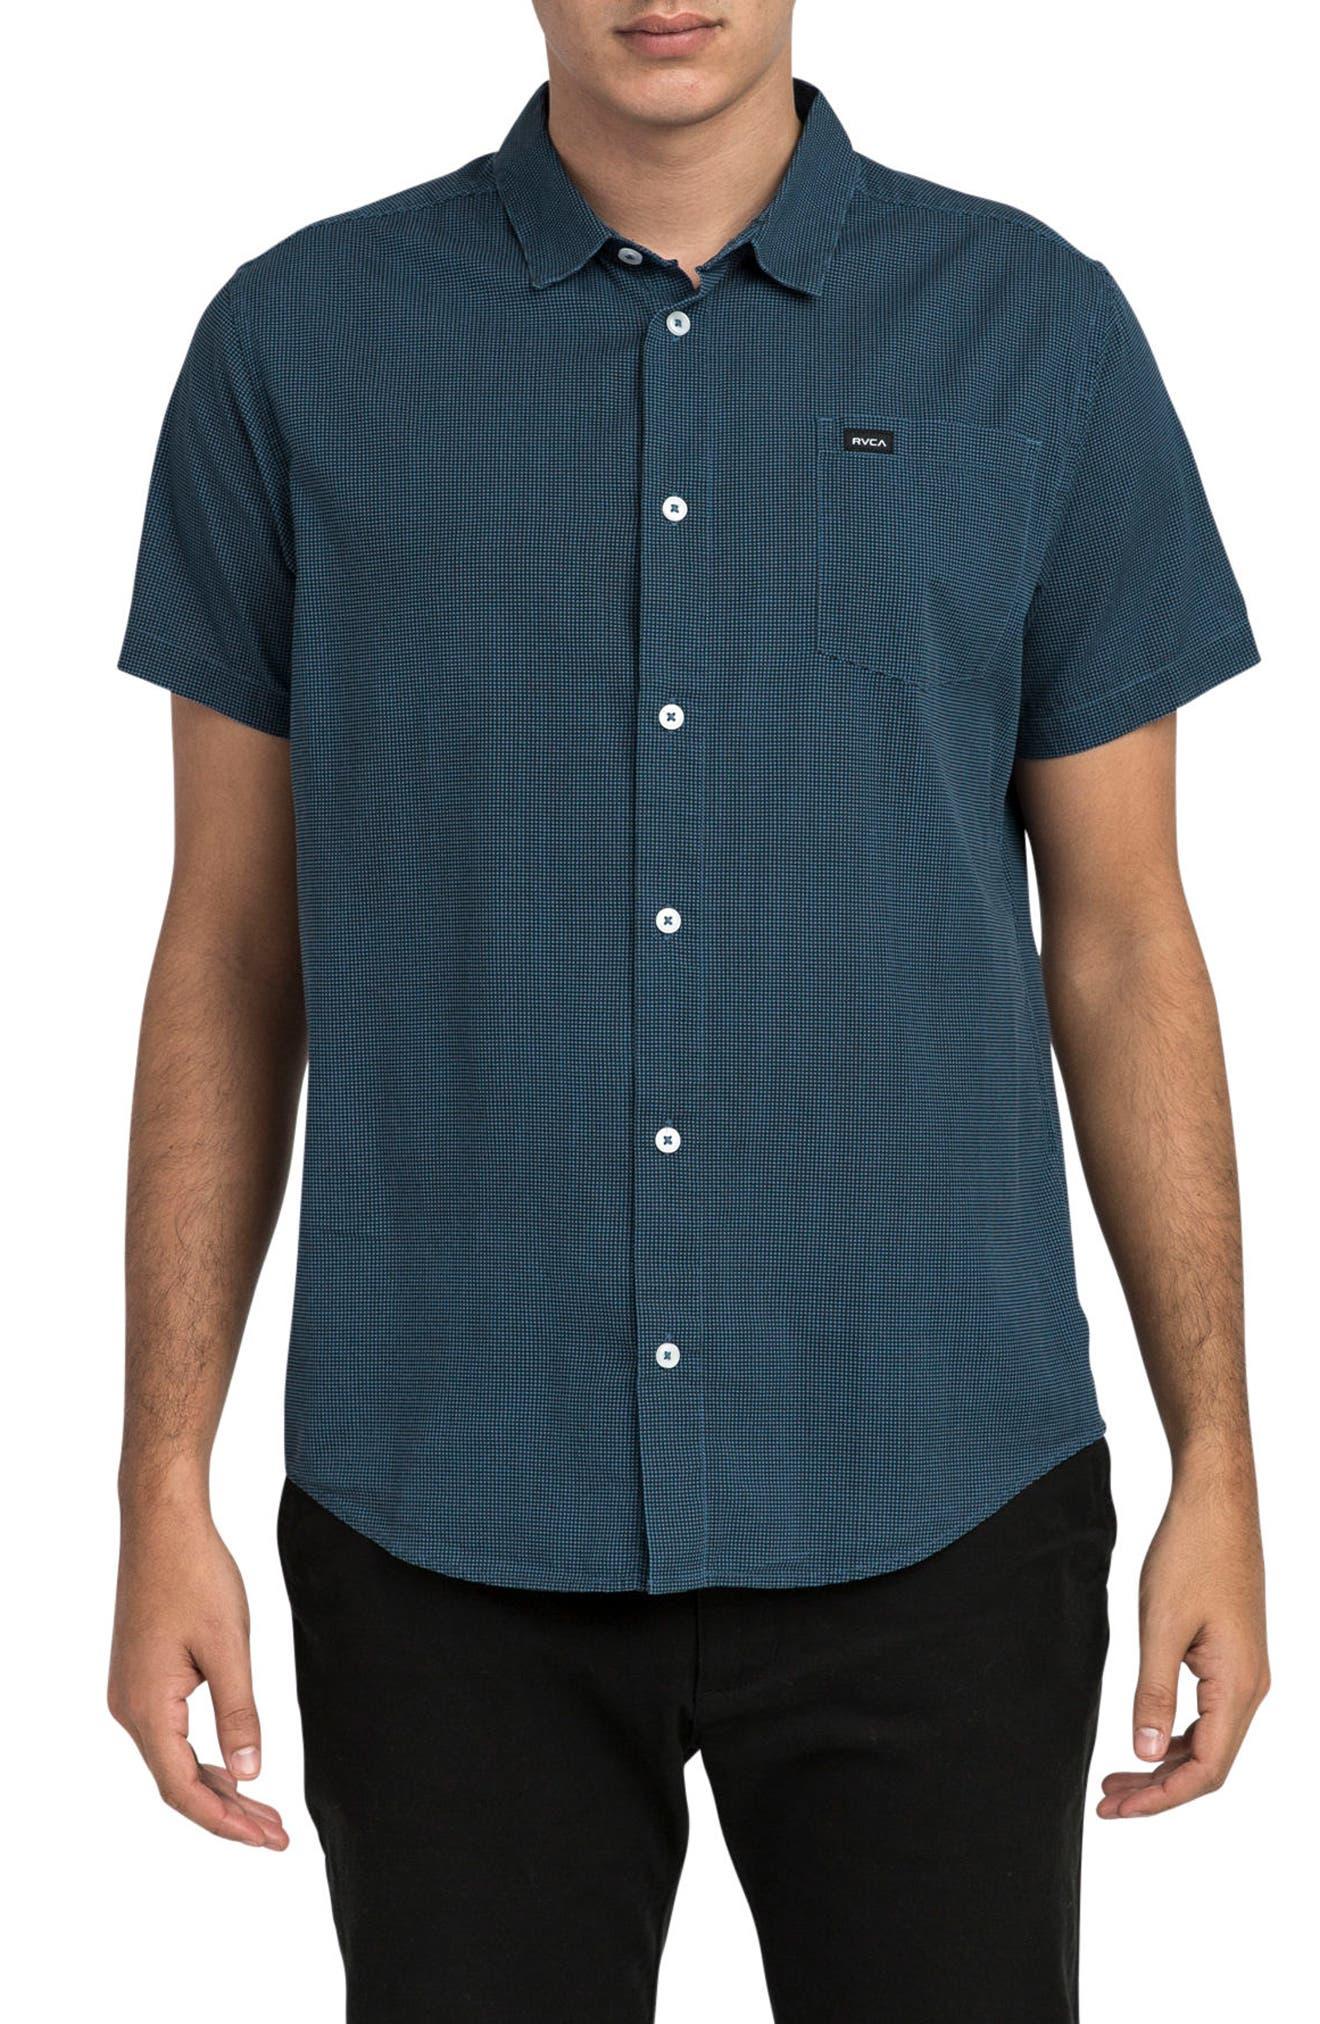 Main Image - RVCA No Name Woven Shirt